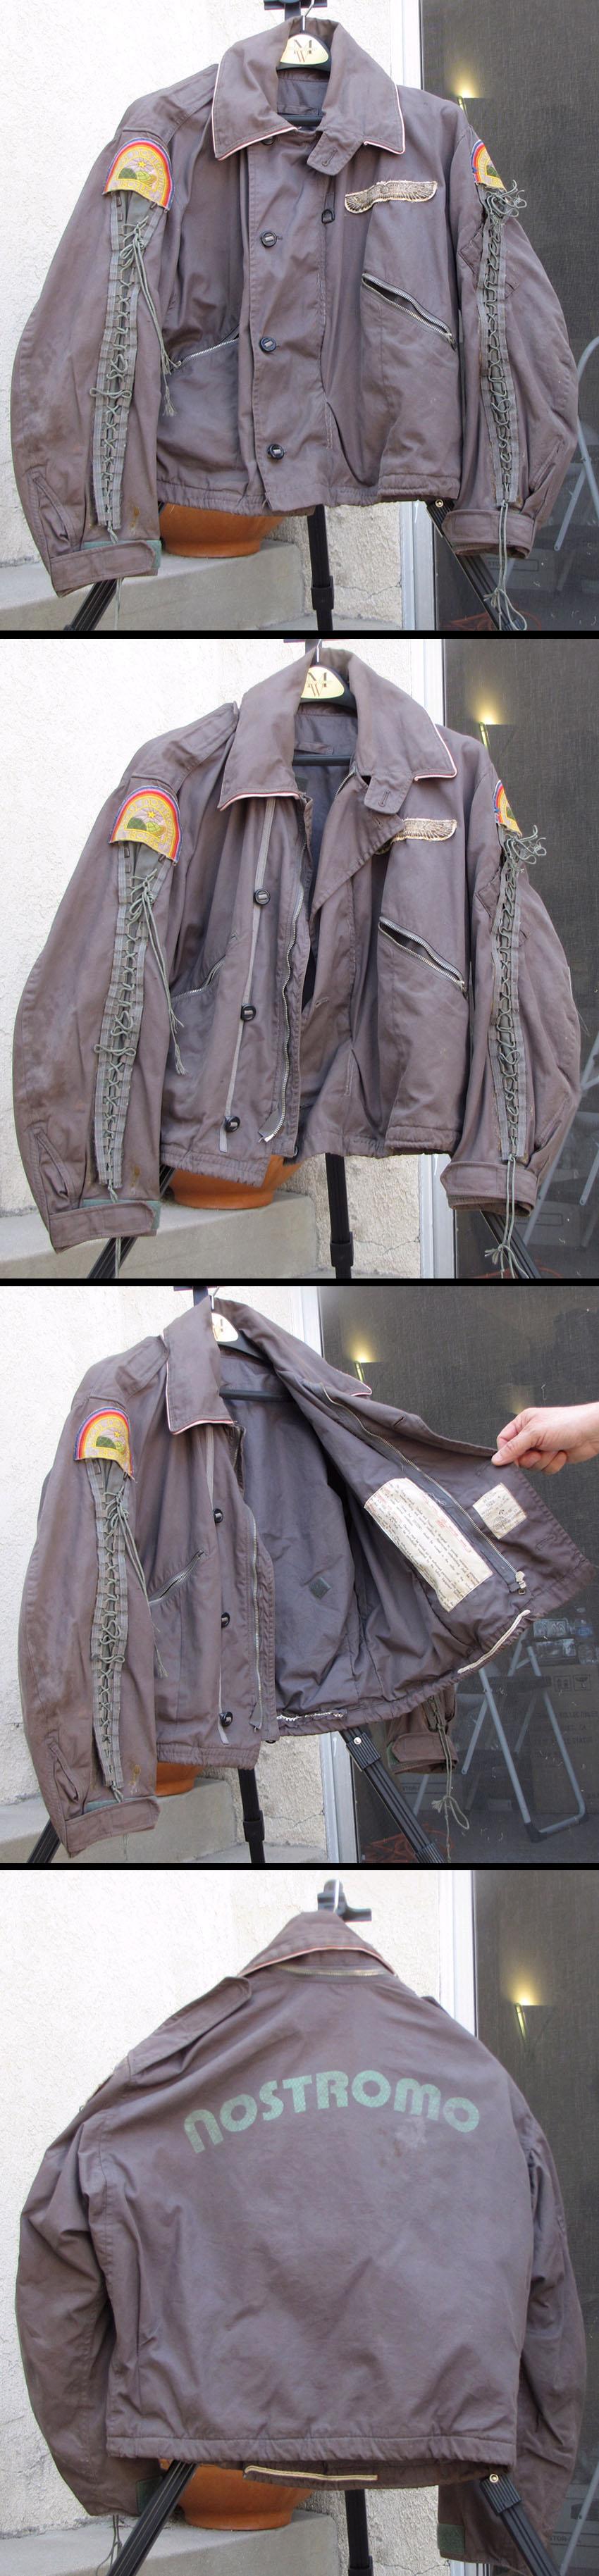 kanes_jacket_01-ACTUAL-SCREEN.jpg